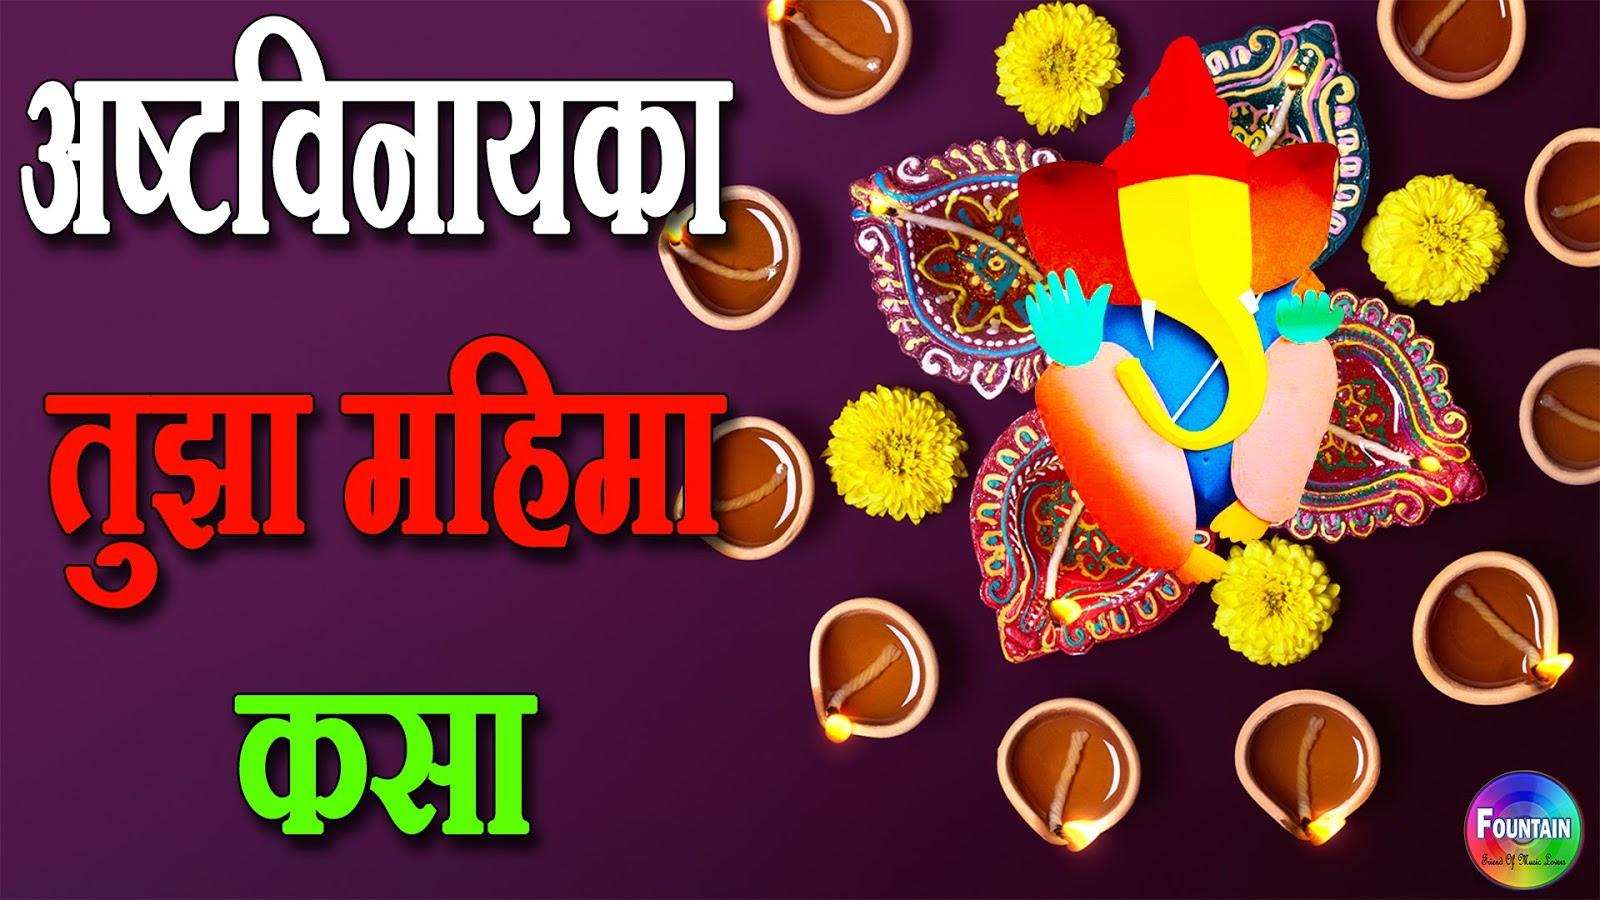 Ganpati Songs Marathi List, Download mp3 and Full HD Video